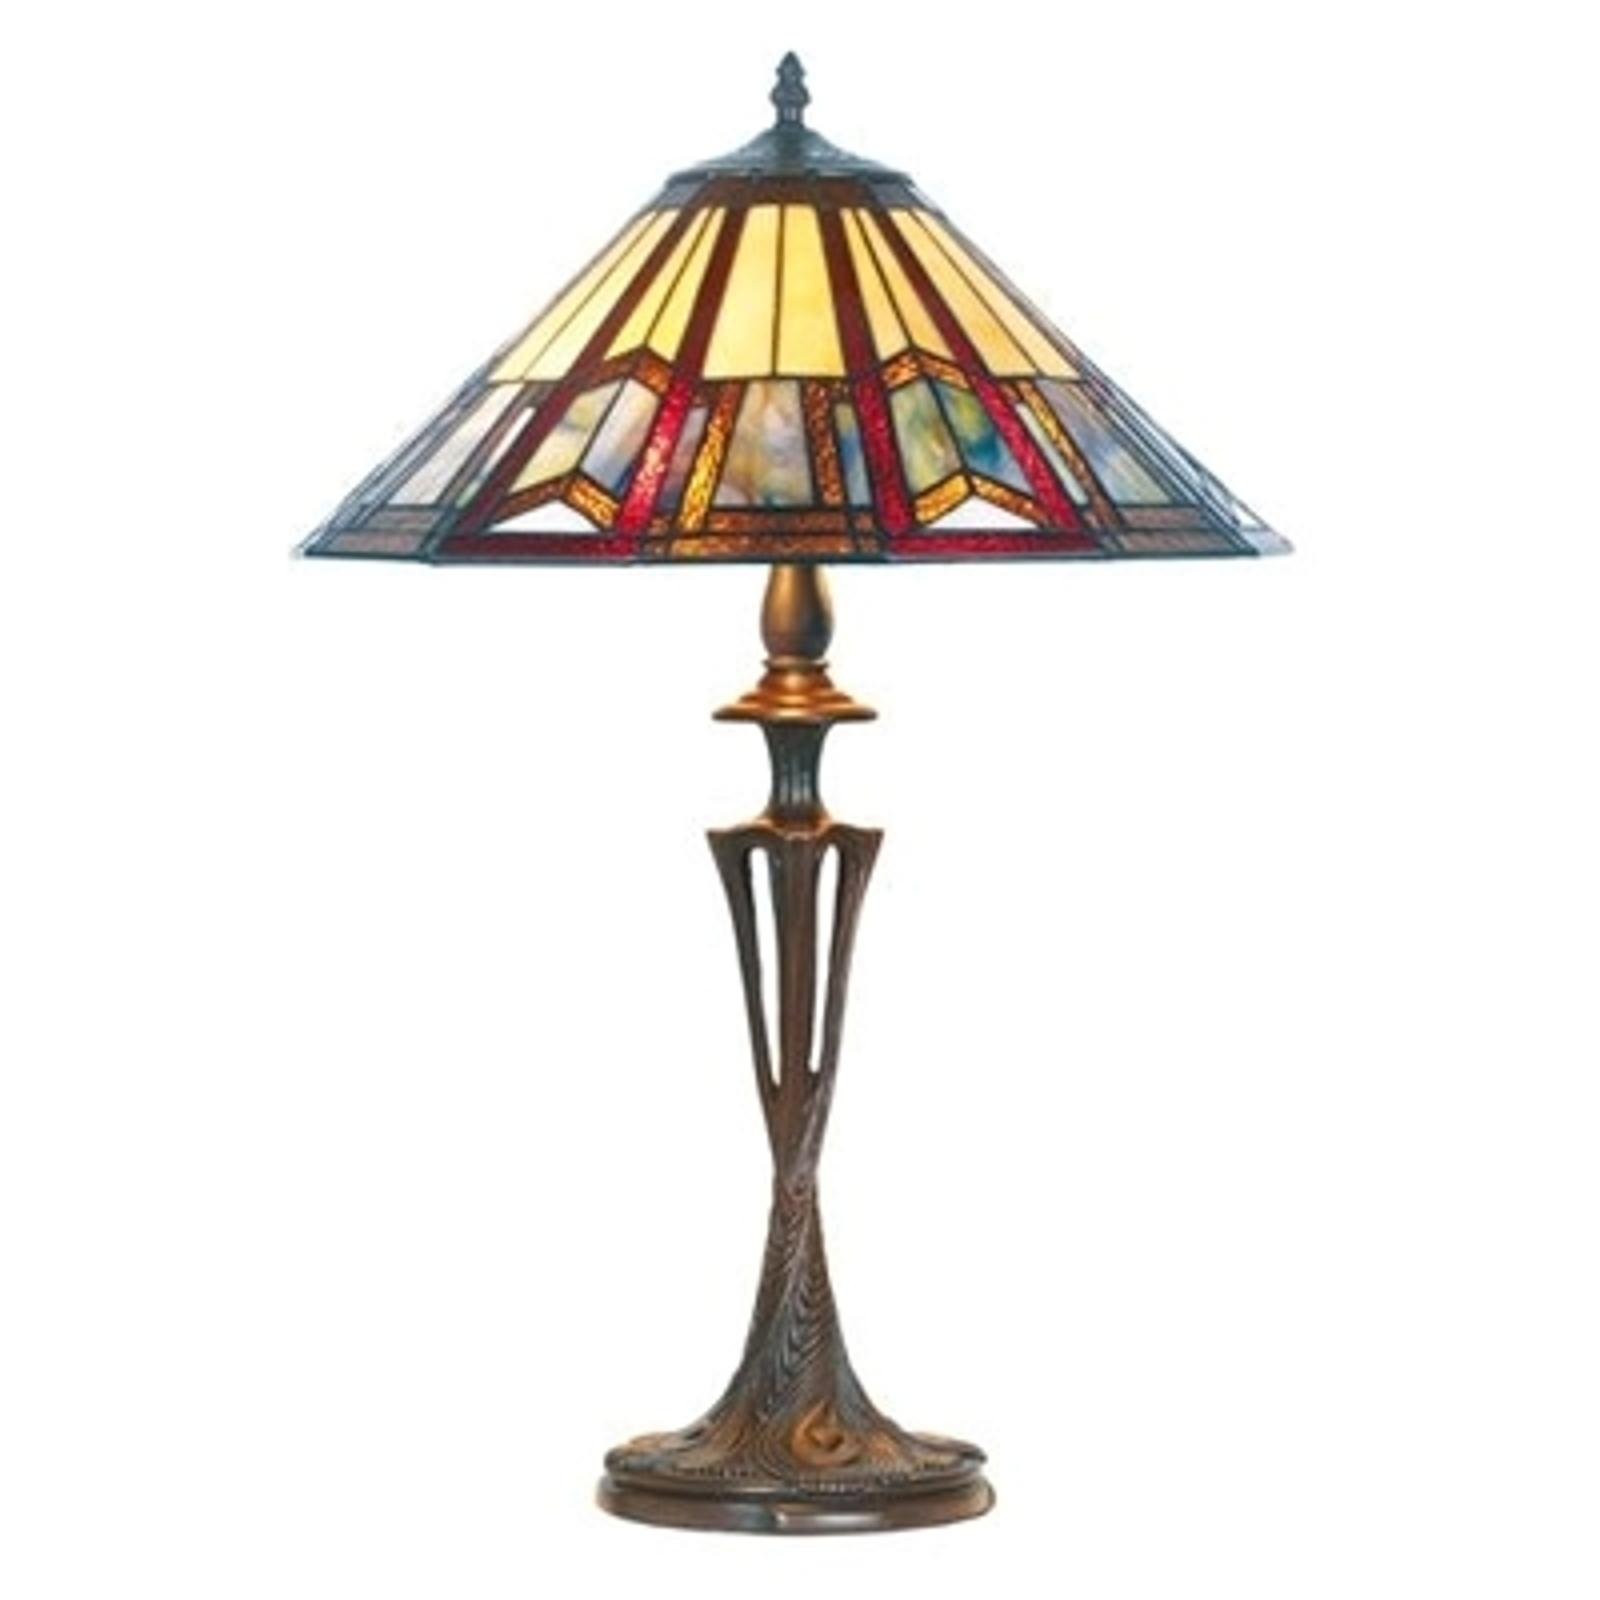 Lillie bordlampe i Tiffany-stil